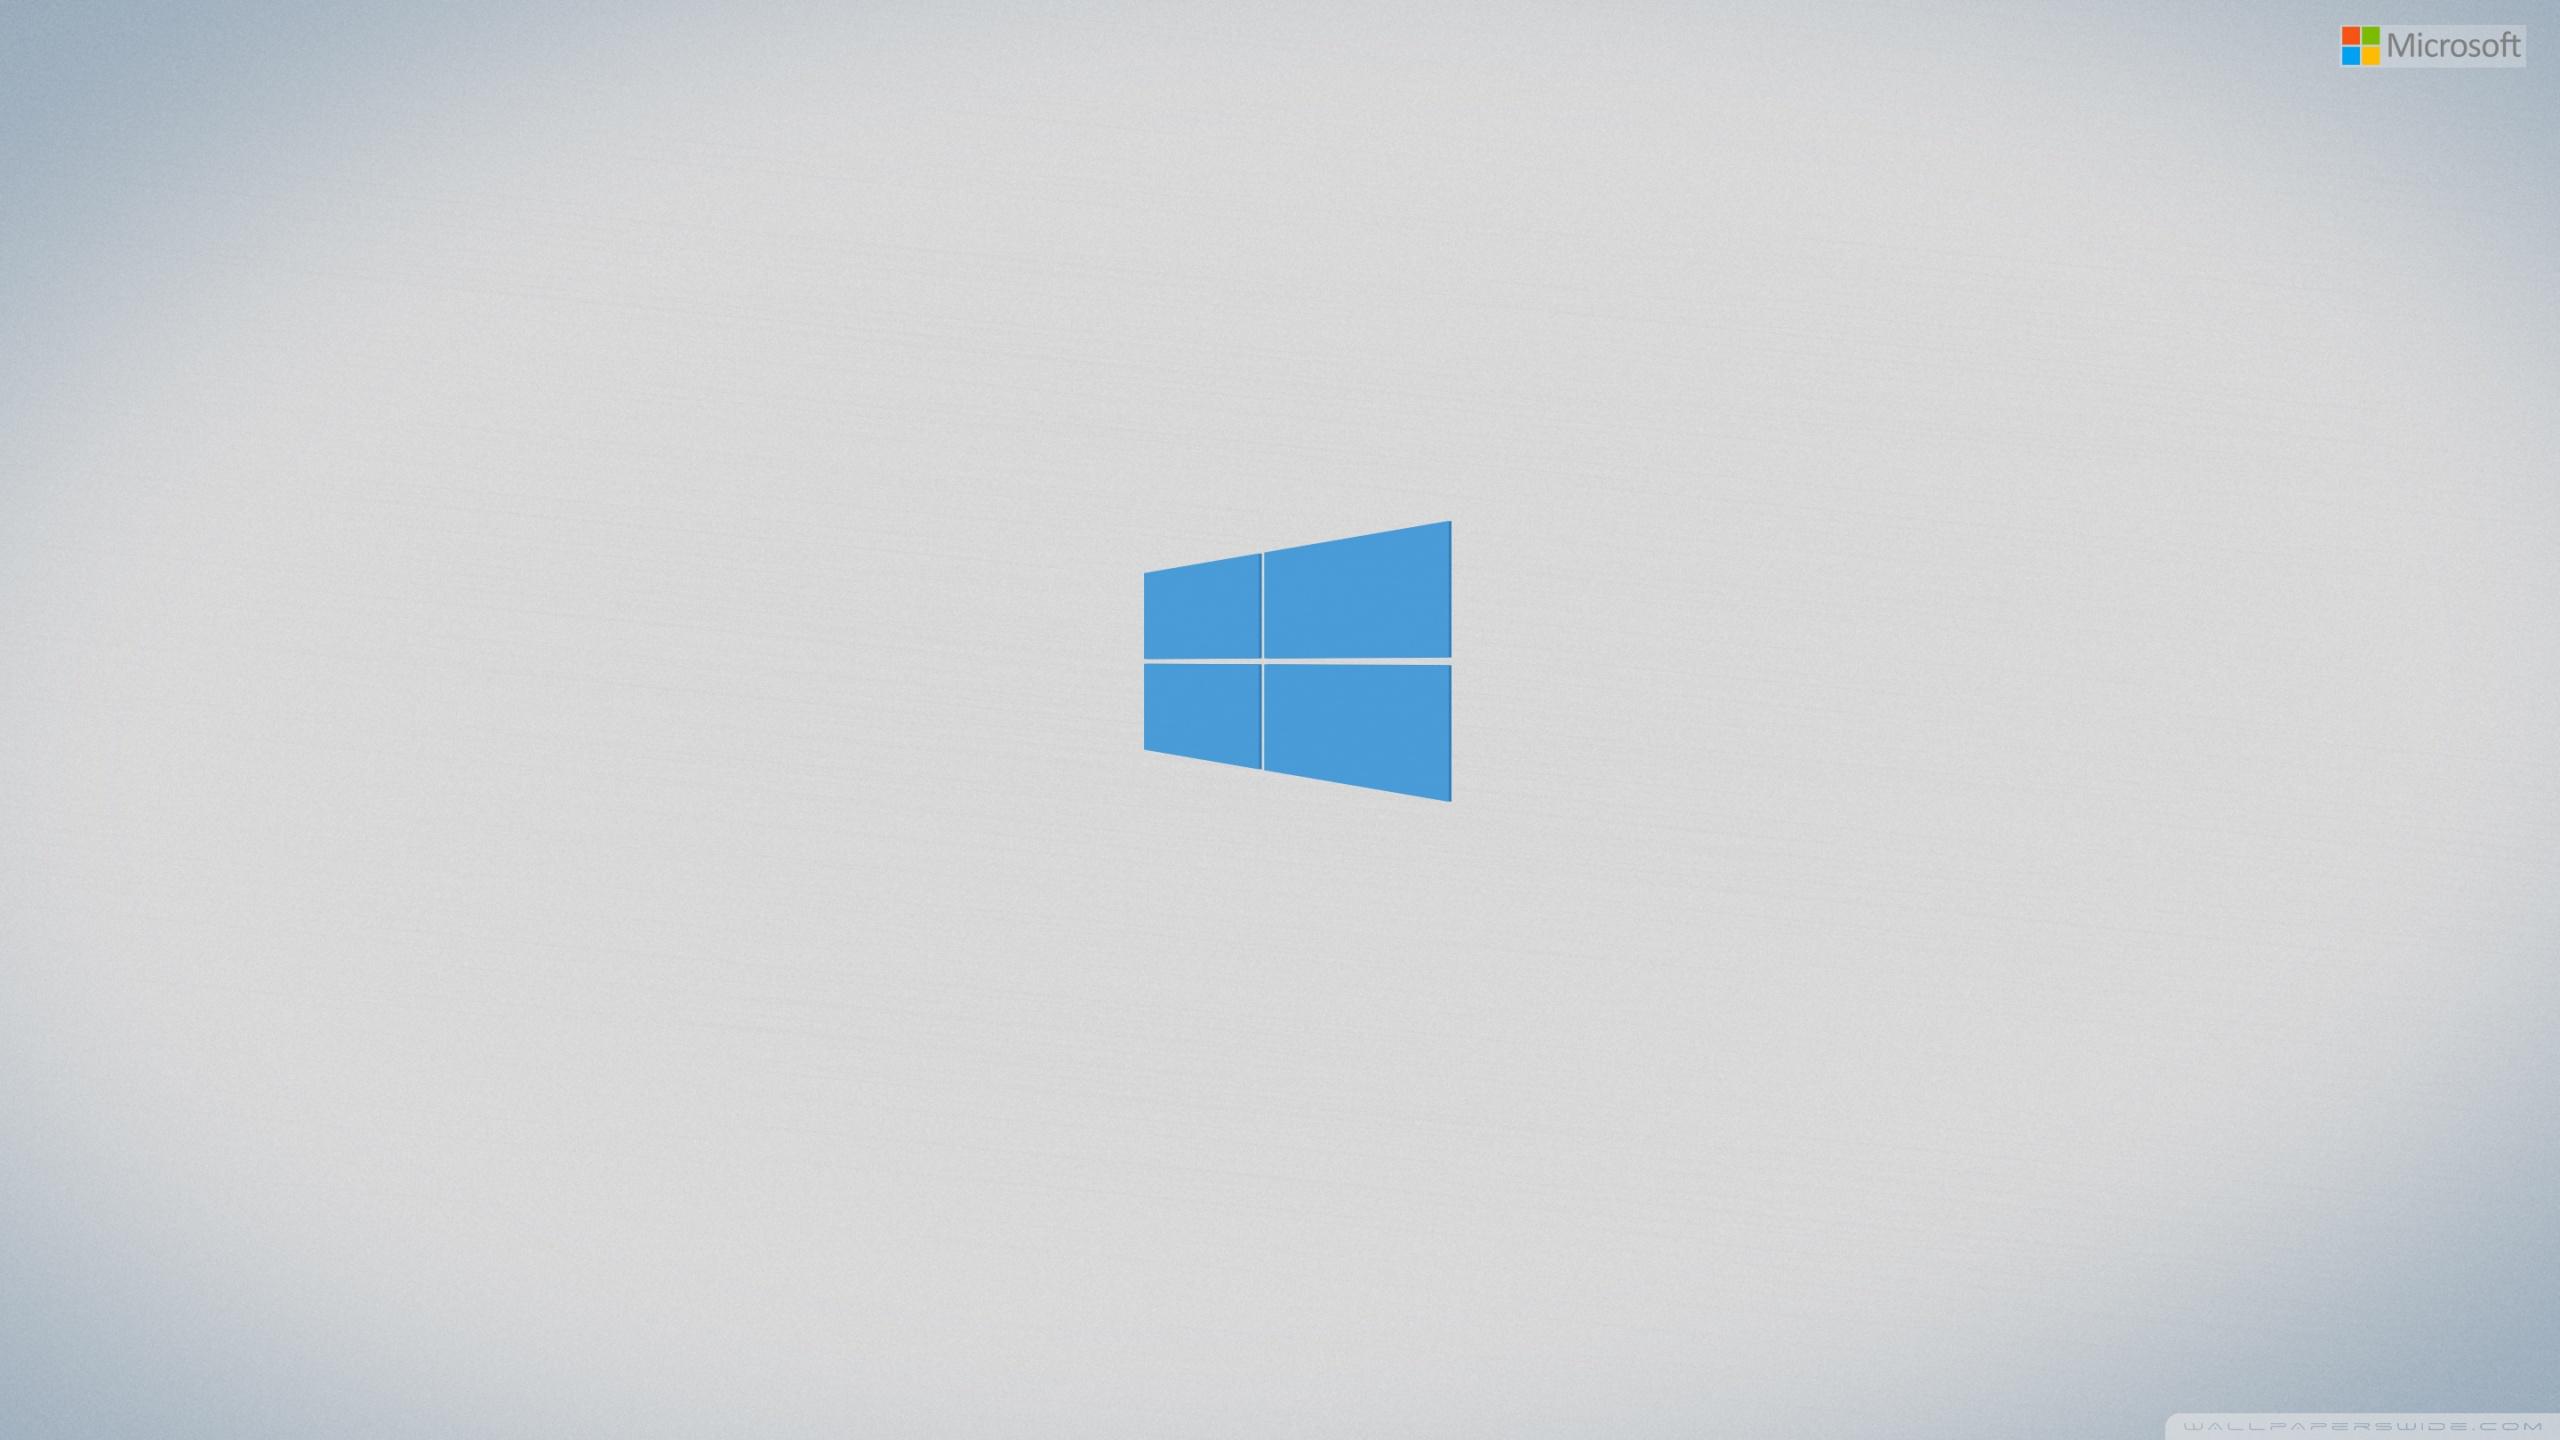 Microsoft Windows 8 Blue HD desktop wallpaper : High Definition